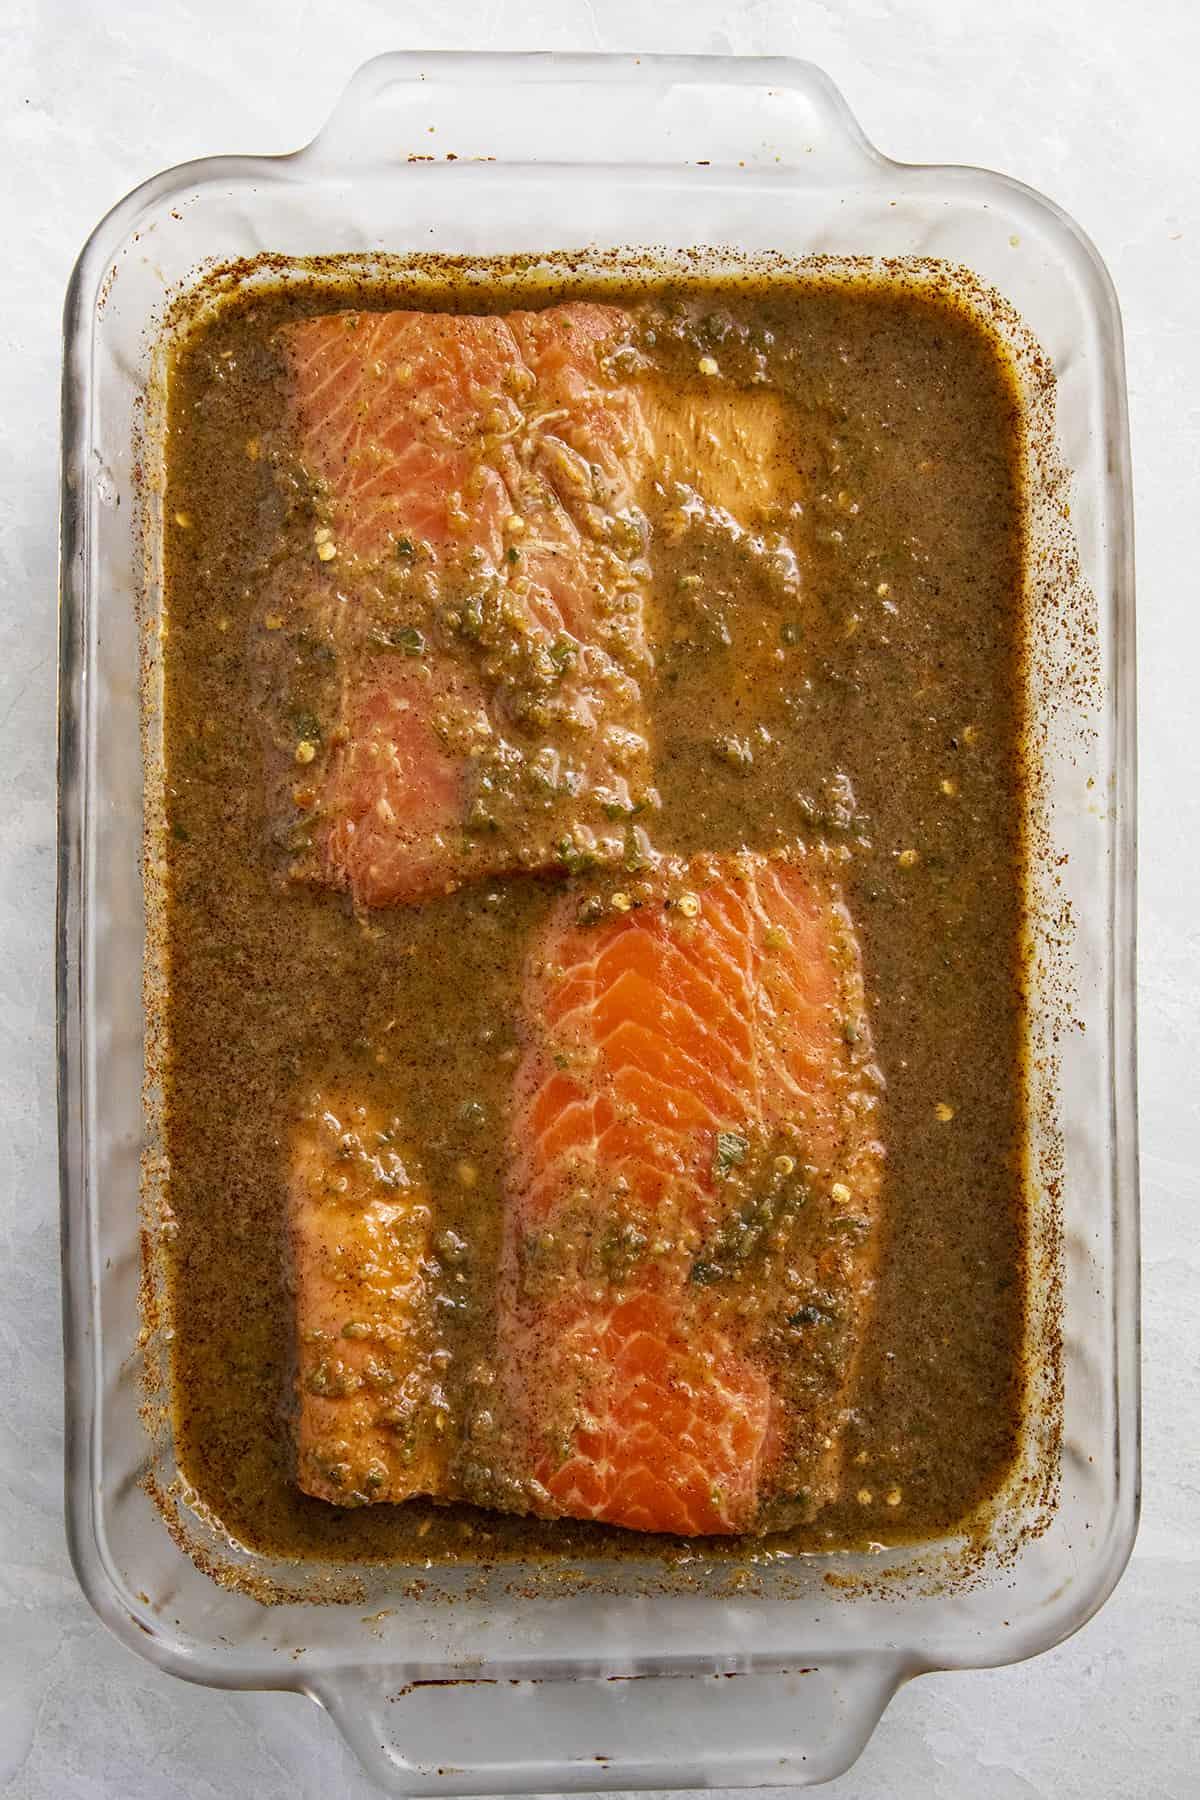 Jerk Salmon marinating in a spicy Jamaican jerk marinade